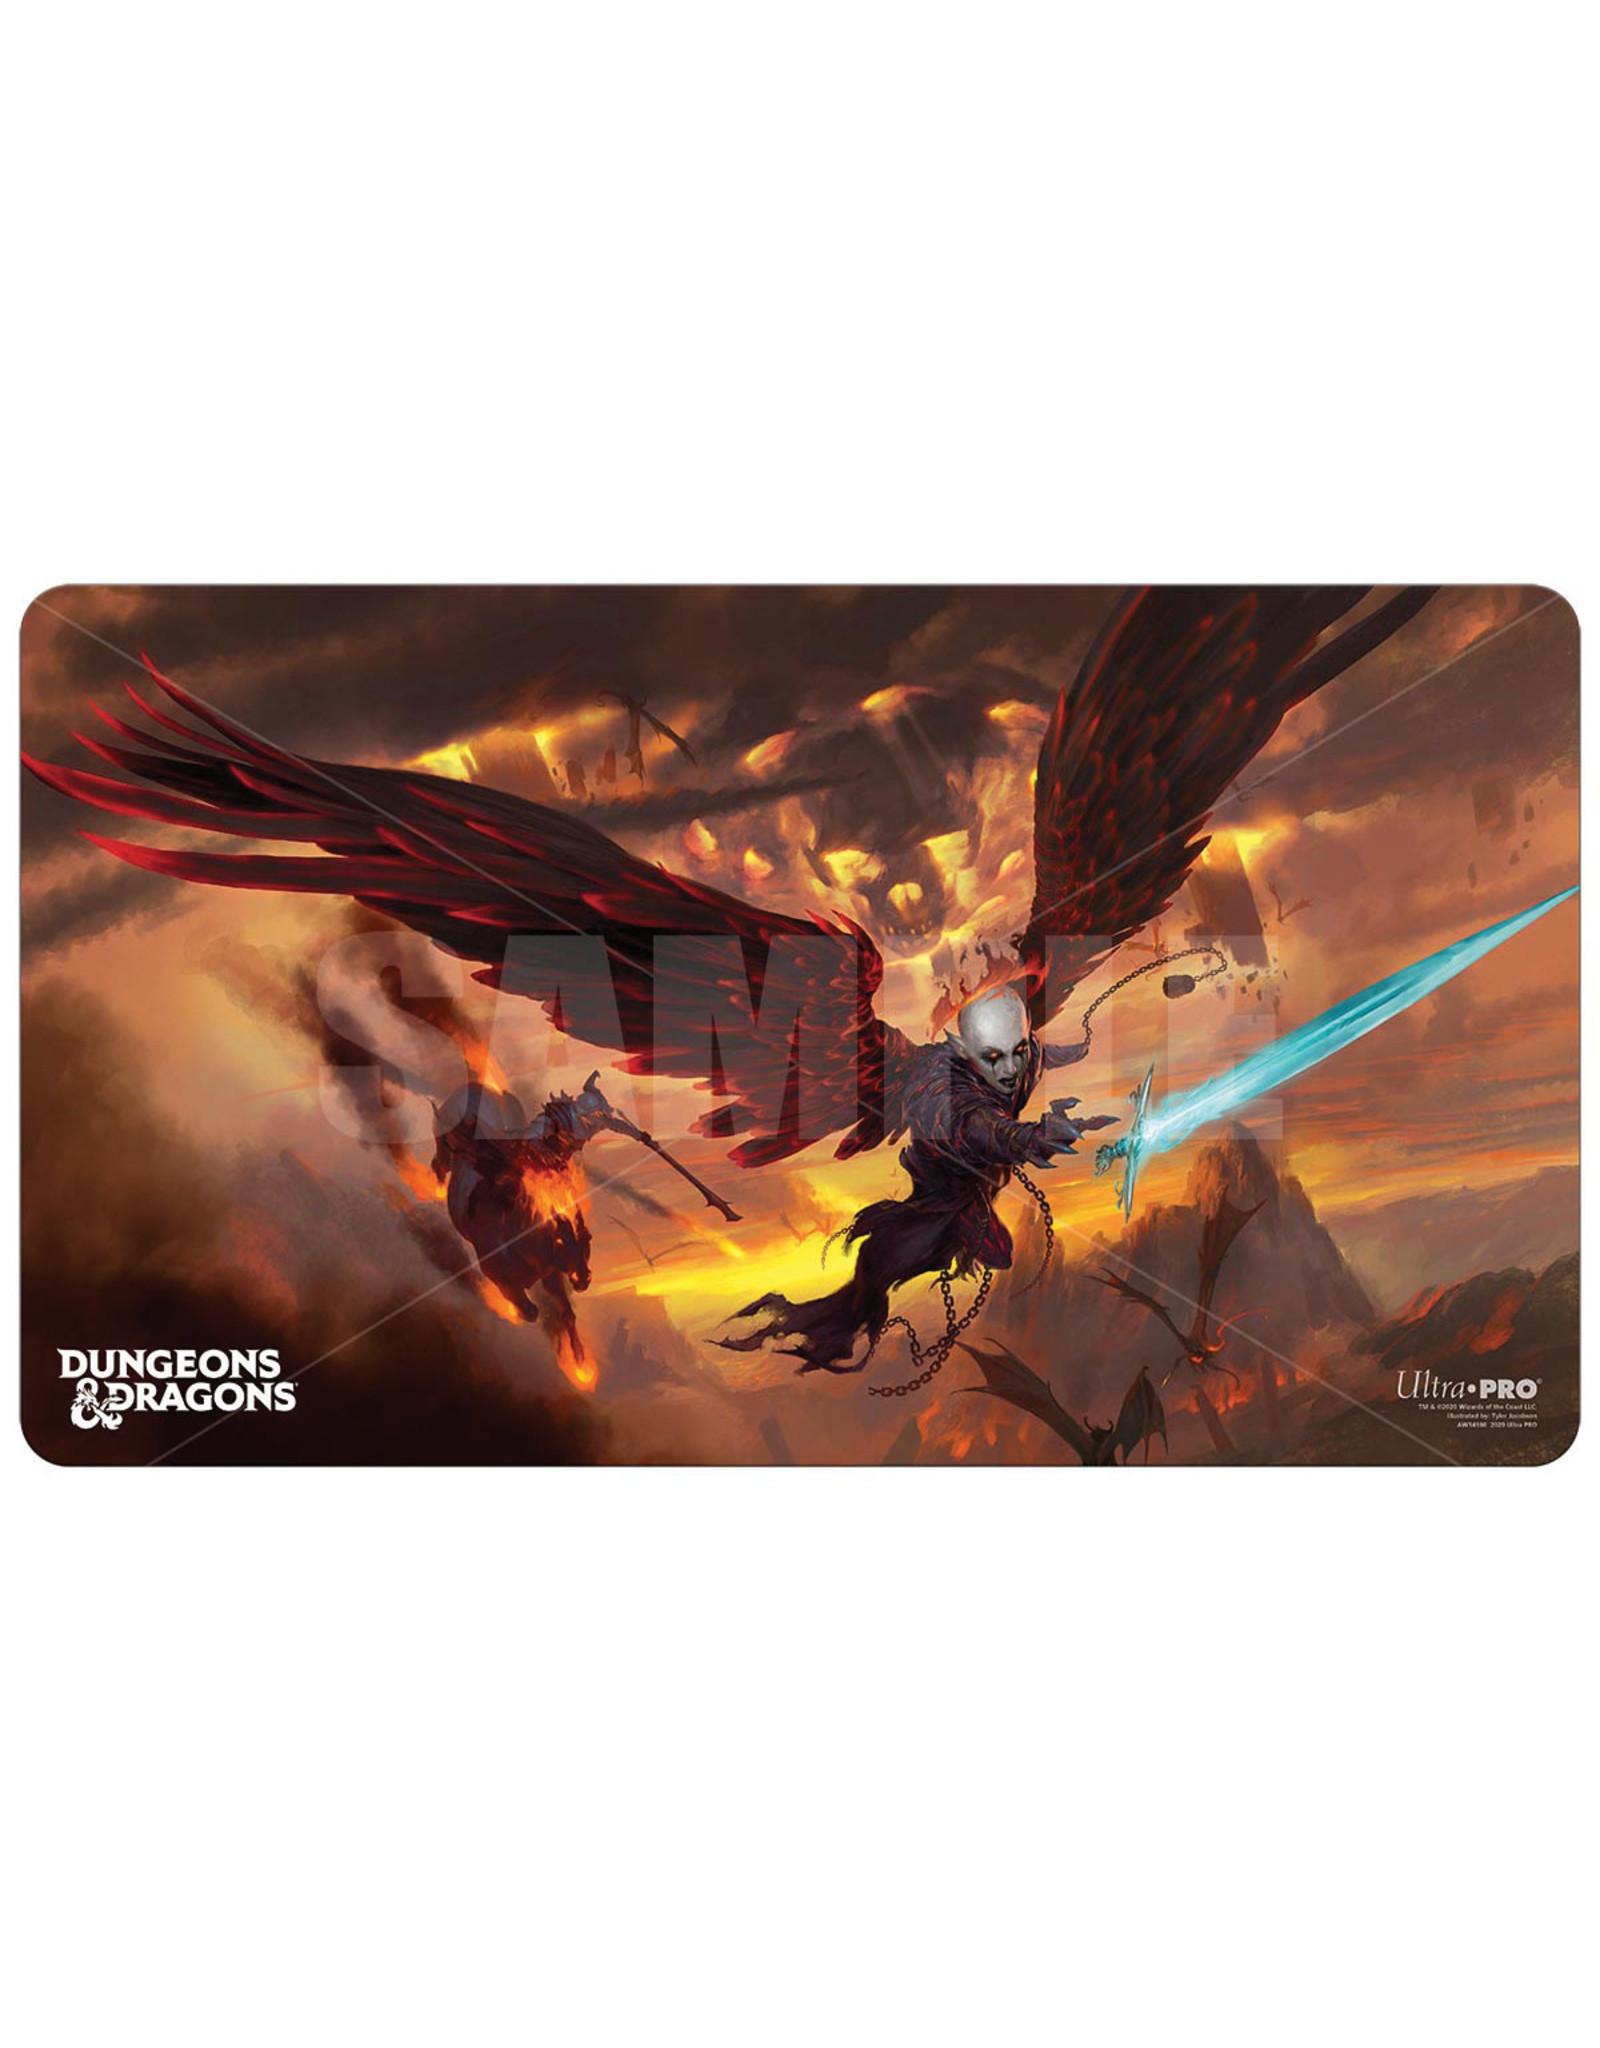 Ultra Pro Dungeons & Dragons: Cover Series Playmat - Baldurs Gate Descent Into Avernus